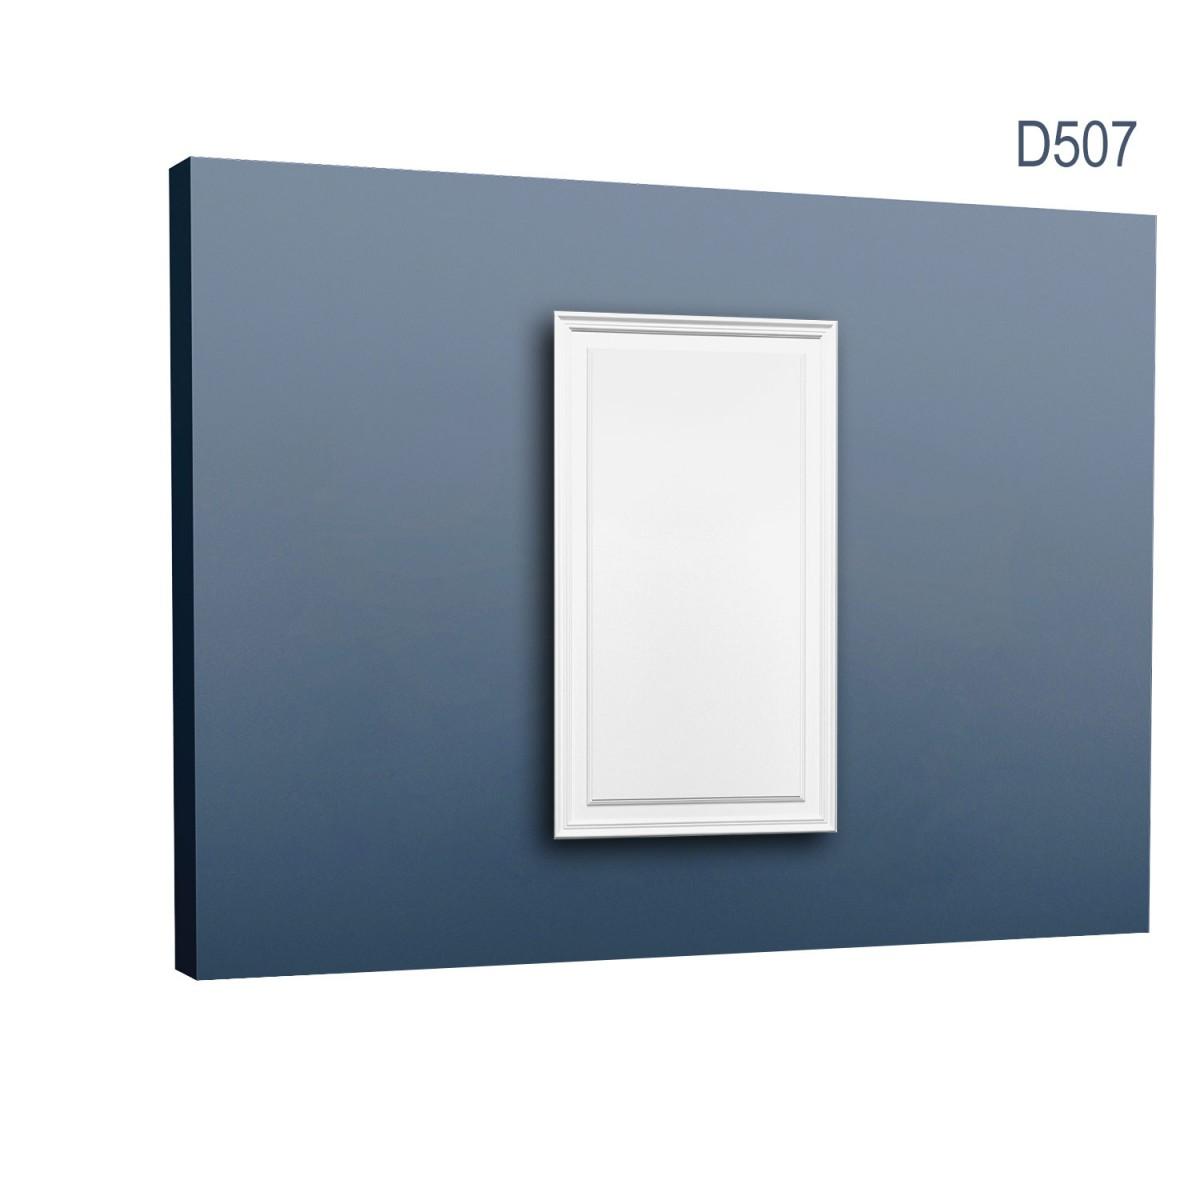 Panou Usa Luxxus D507, Dimensiuni: 55 X 90.5 X 1.7 cm, Orac Decor